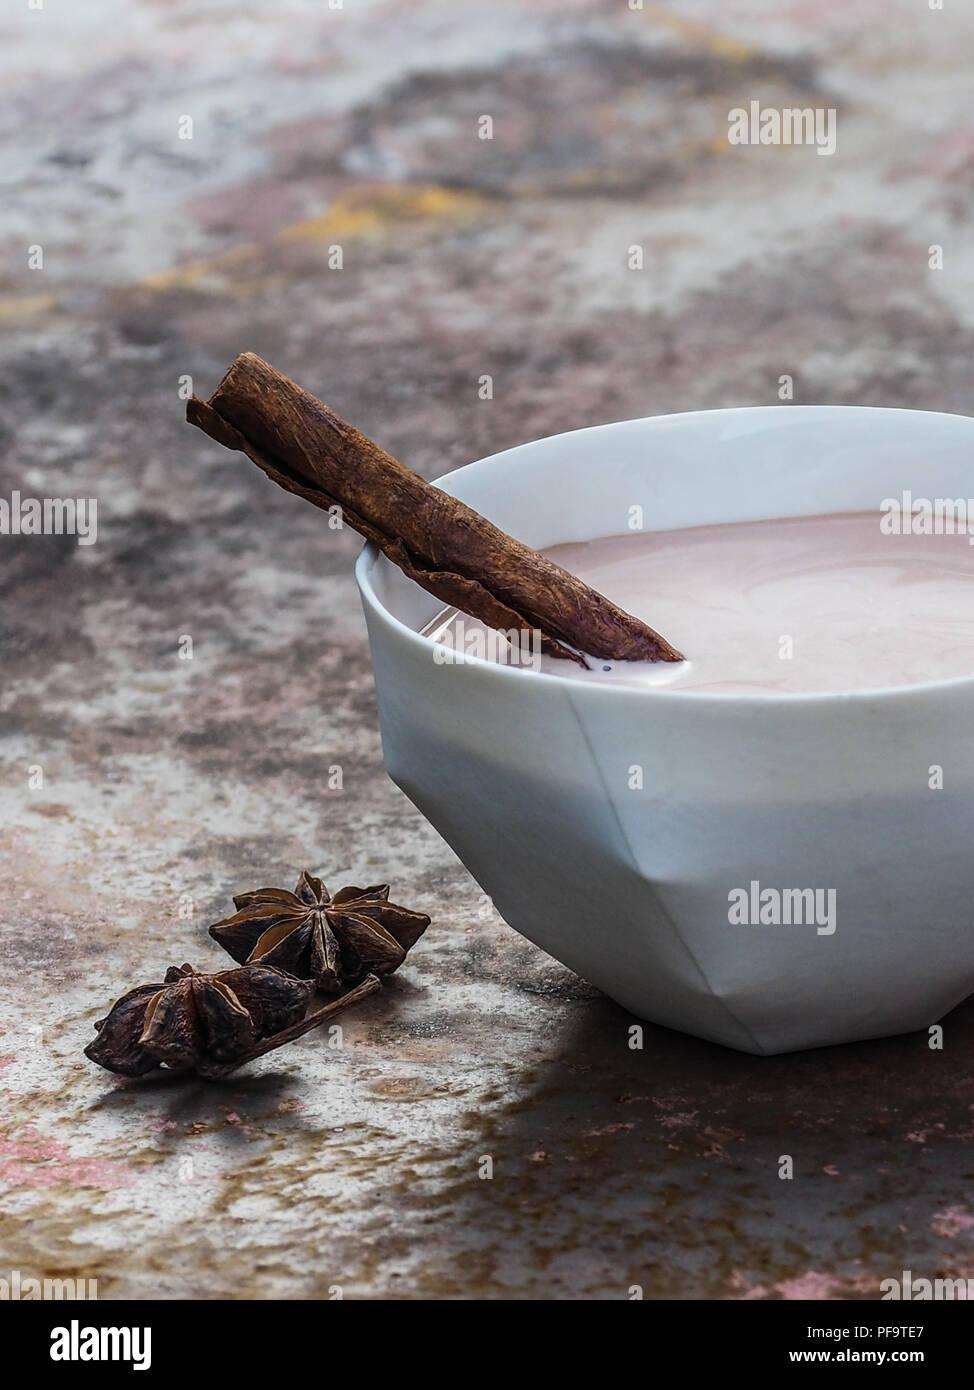 Caseros té chai latte con el palo de canela. Imagen De Stock